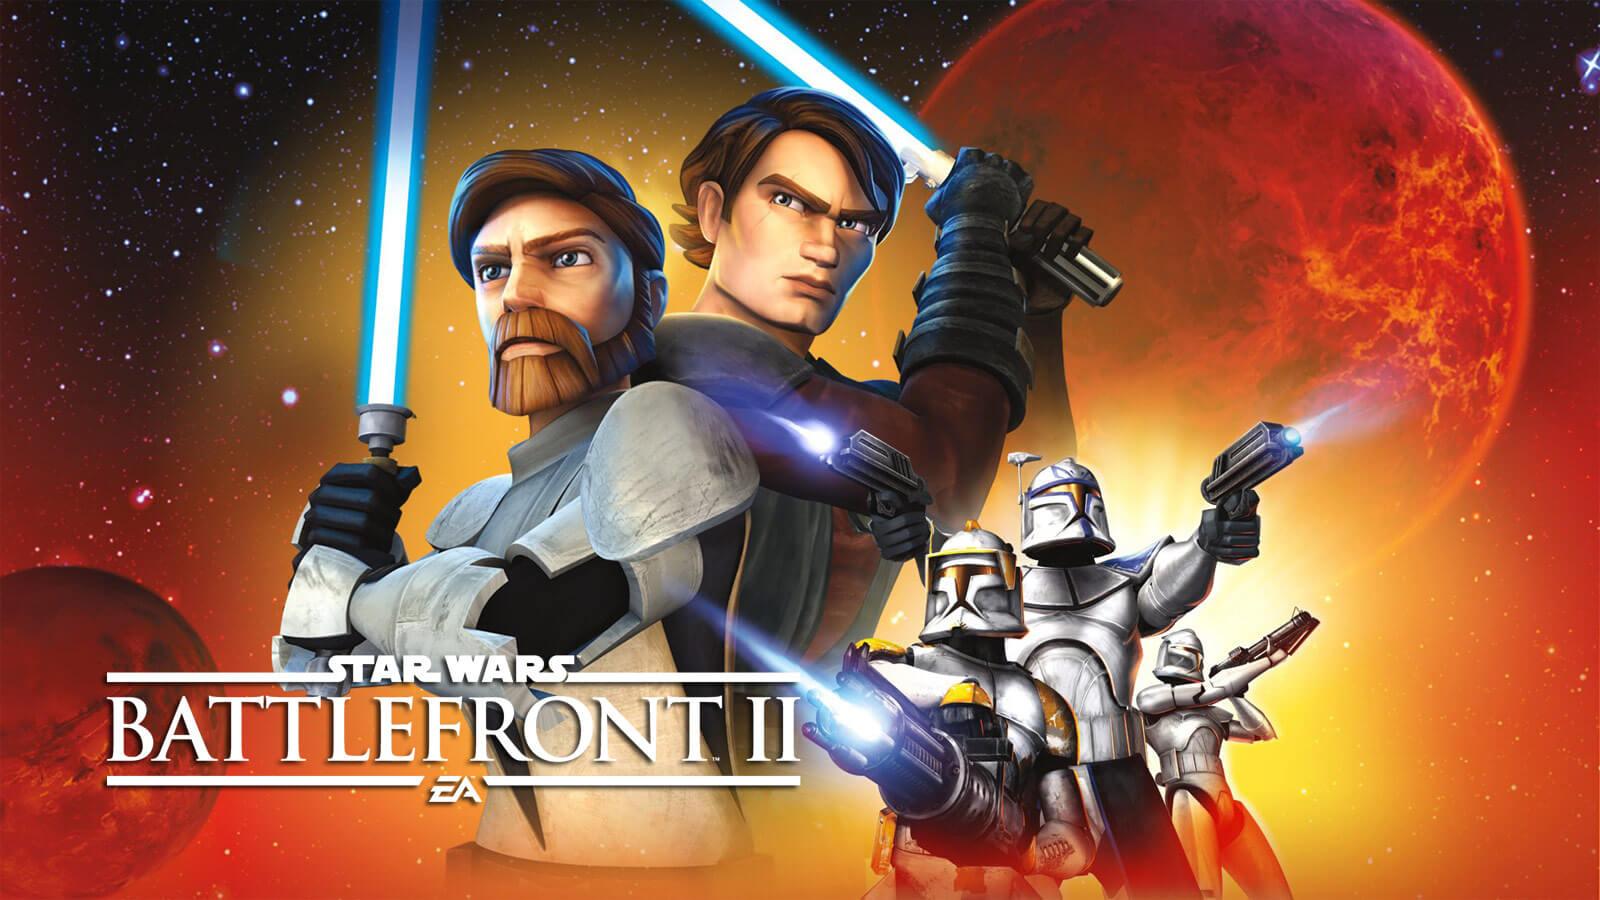 Star Wars Clone Wars Voice Cast Returns For Battlefront Ii Gameslaught